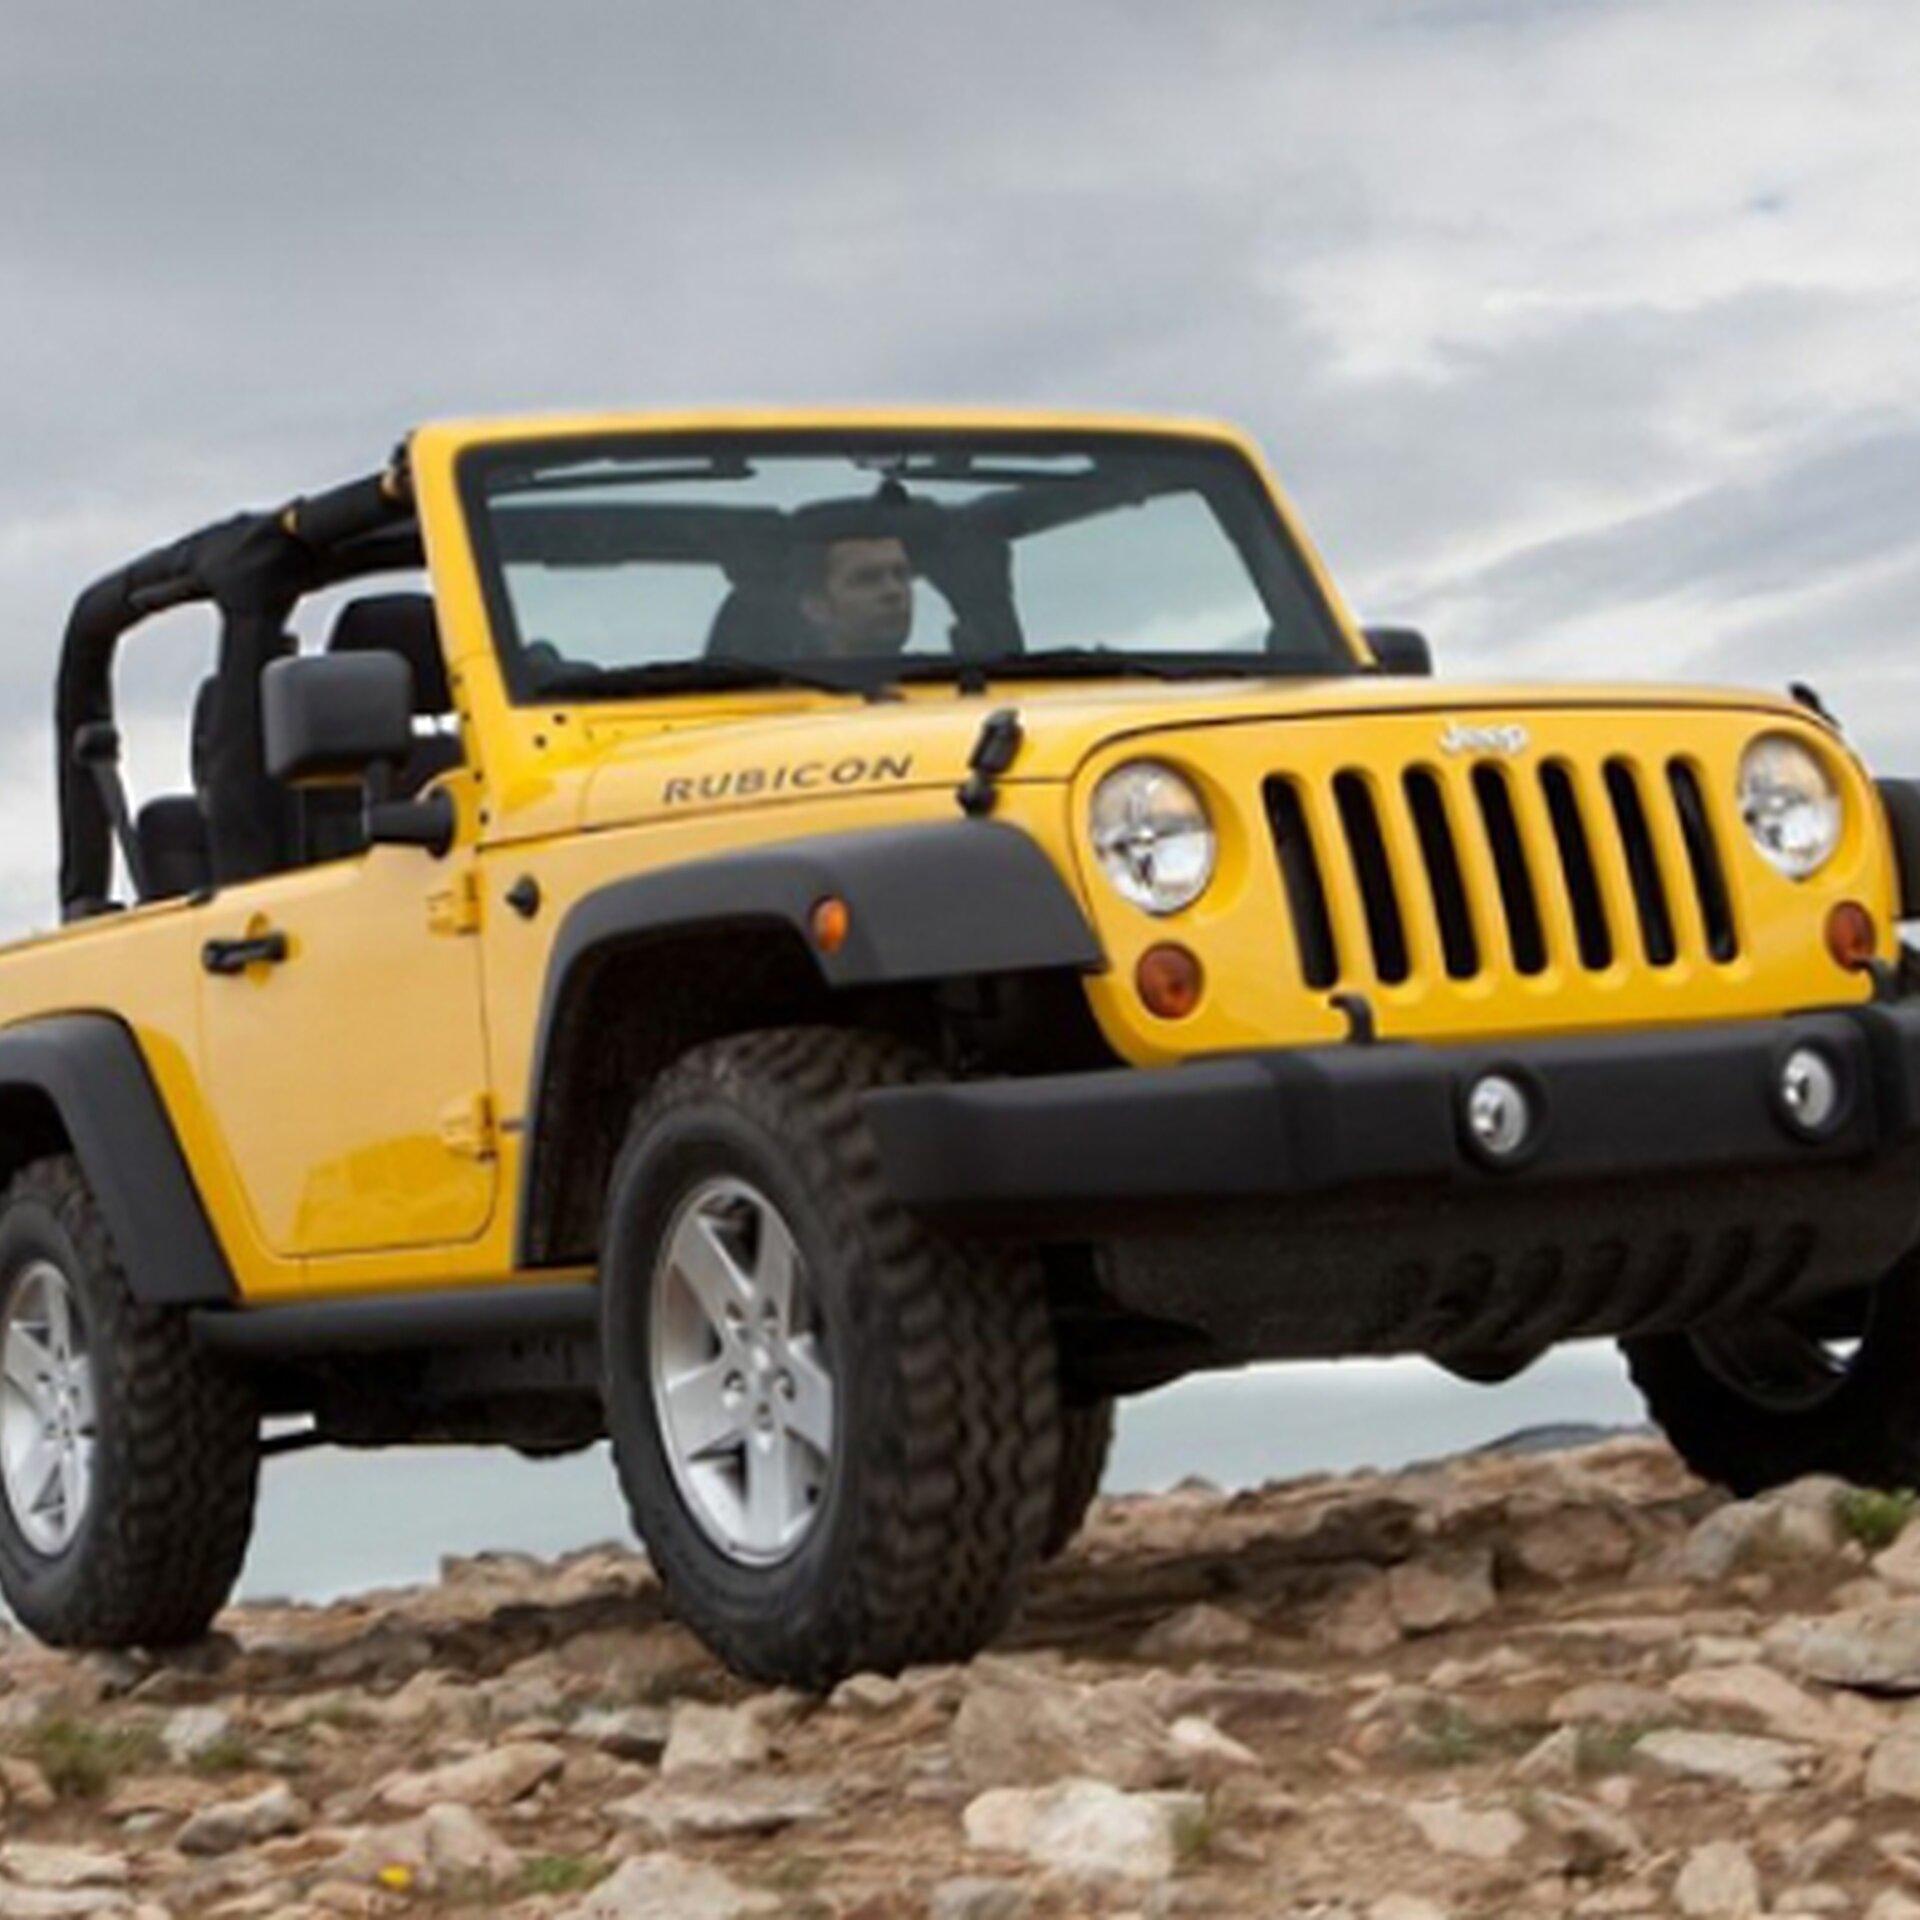 Aruba Car U0026 Jeep Rental Companies   Budget Car Rental